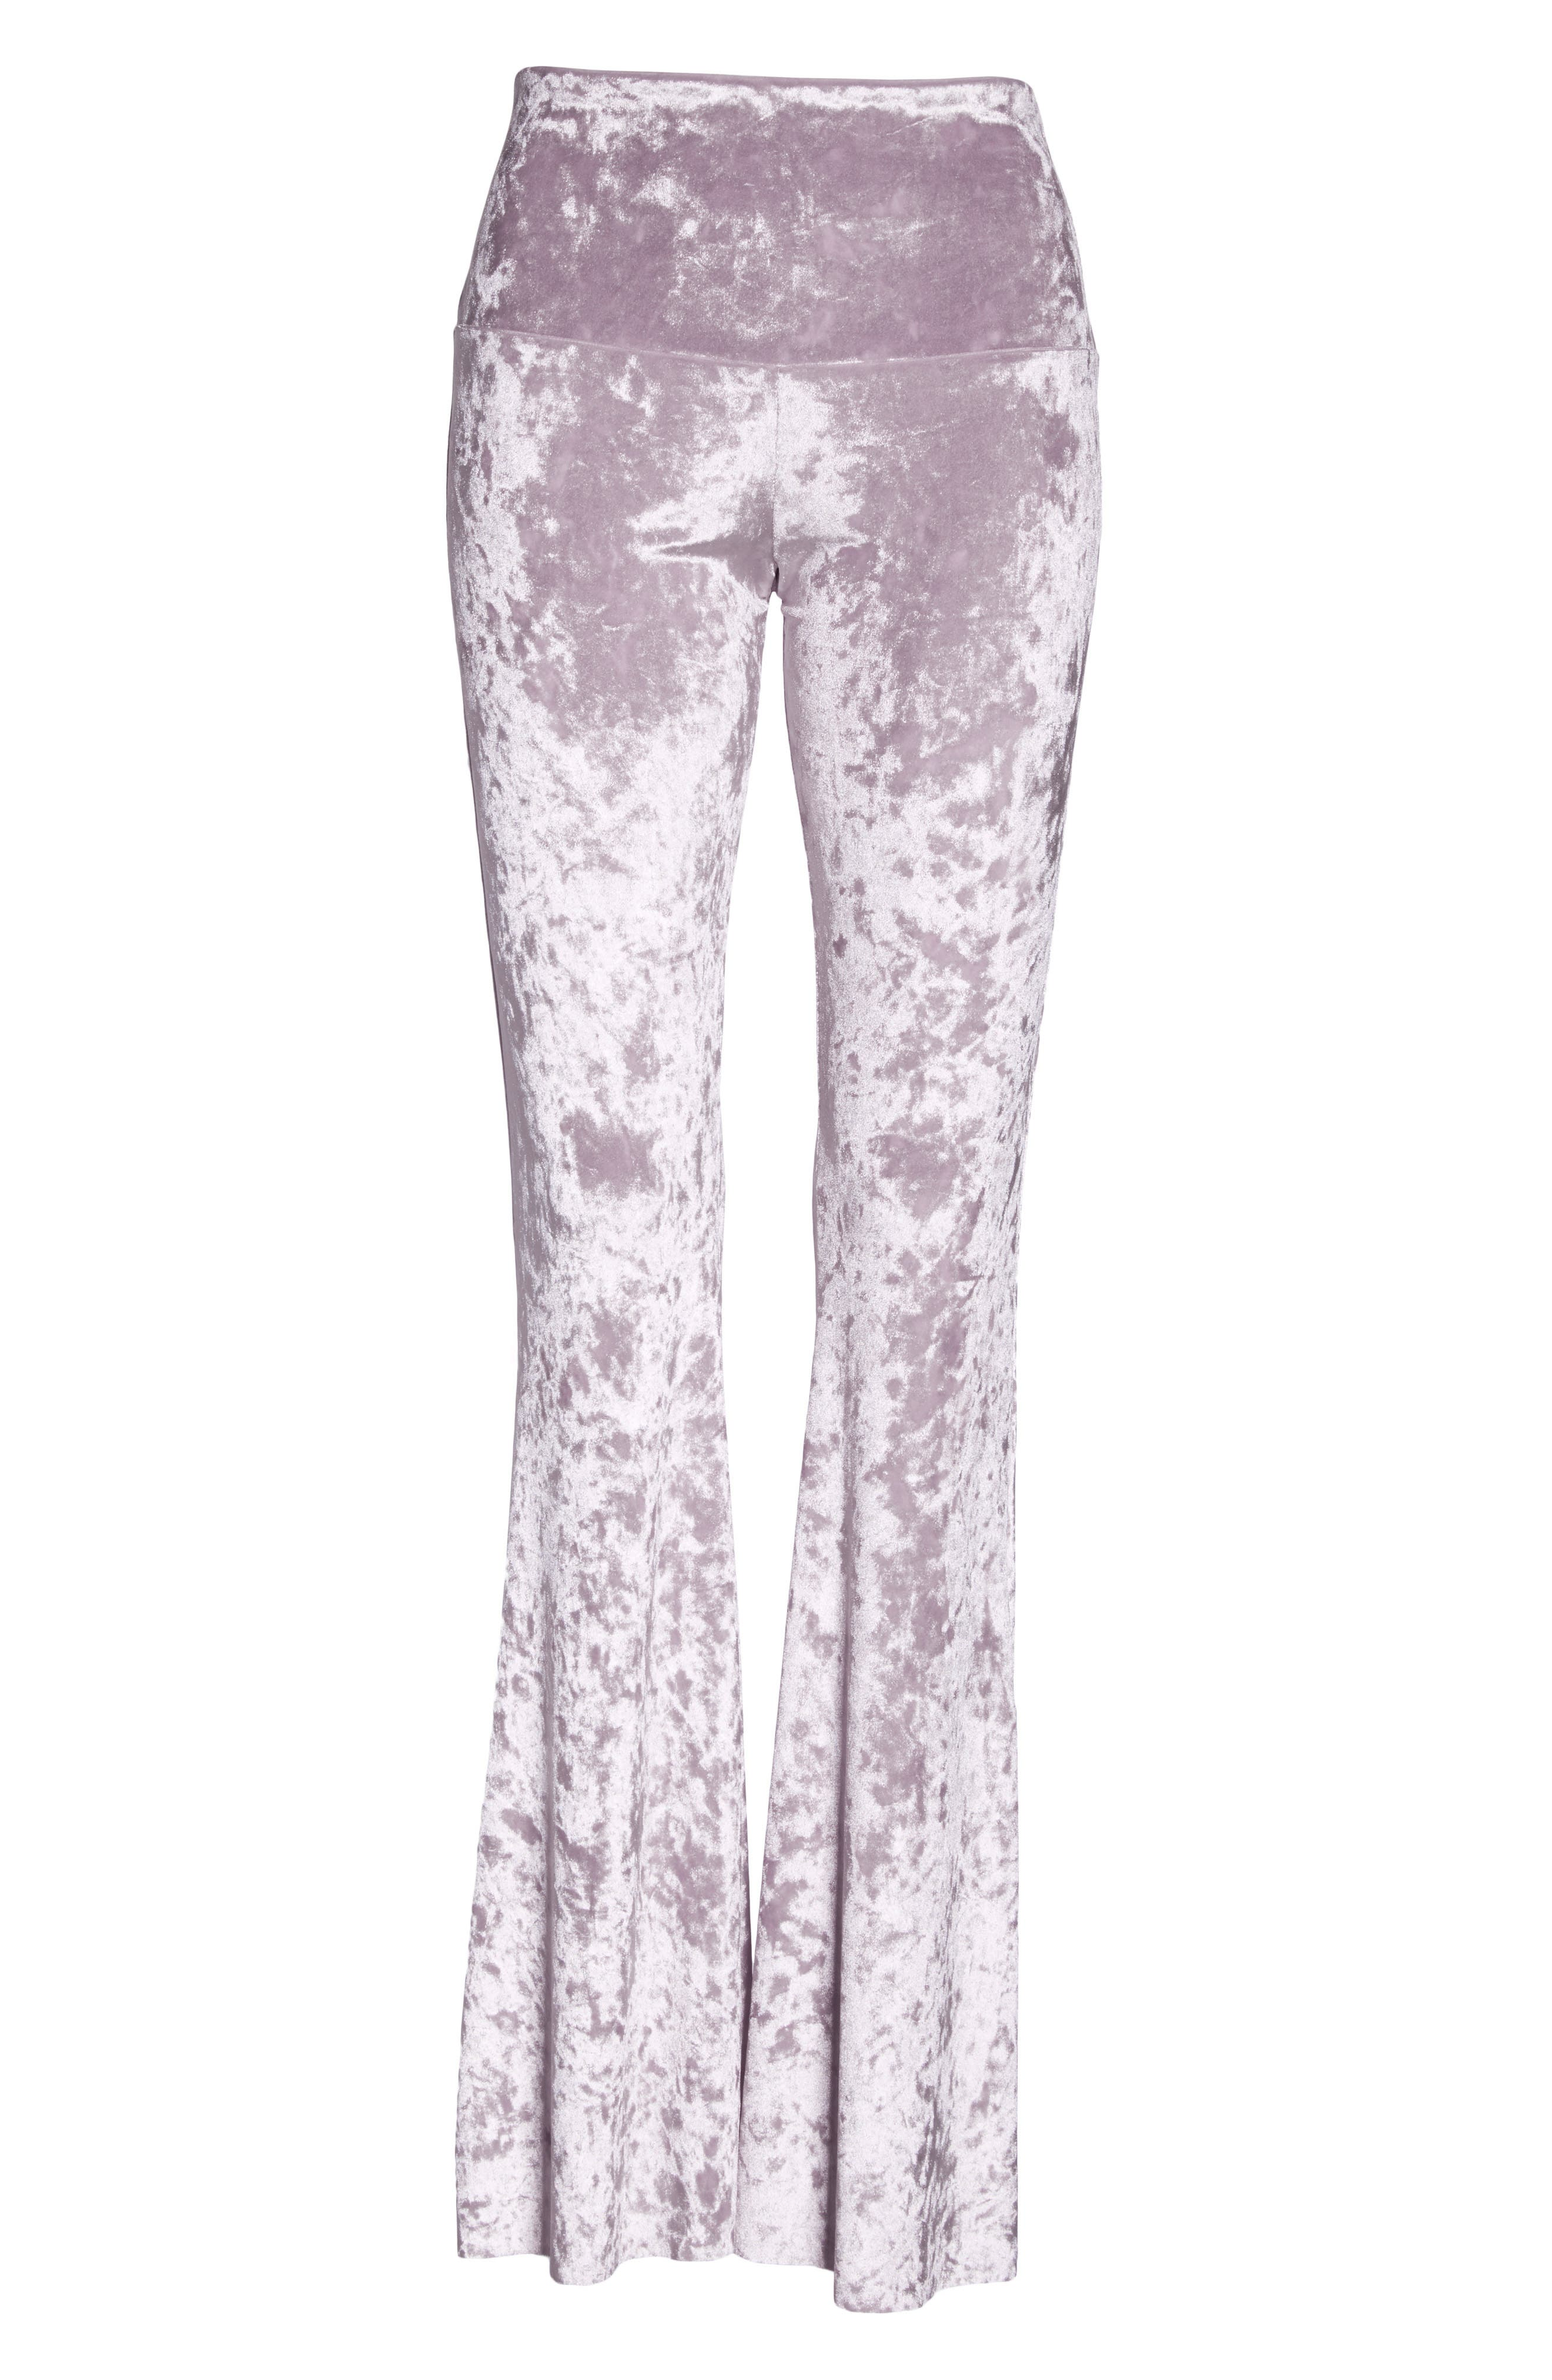 Flare Leg Yoga Pants,                         Main,                         color, Mist Crushed Velvet